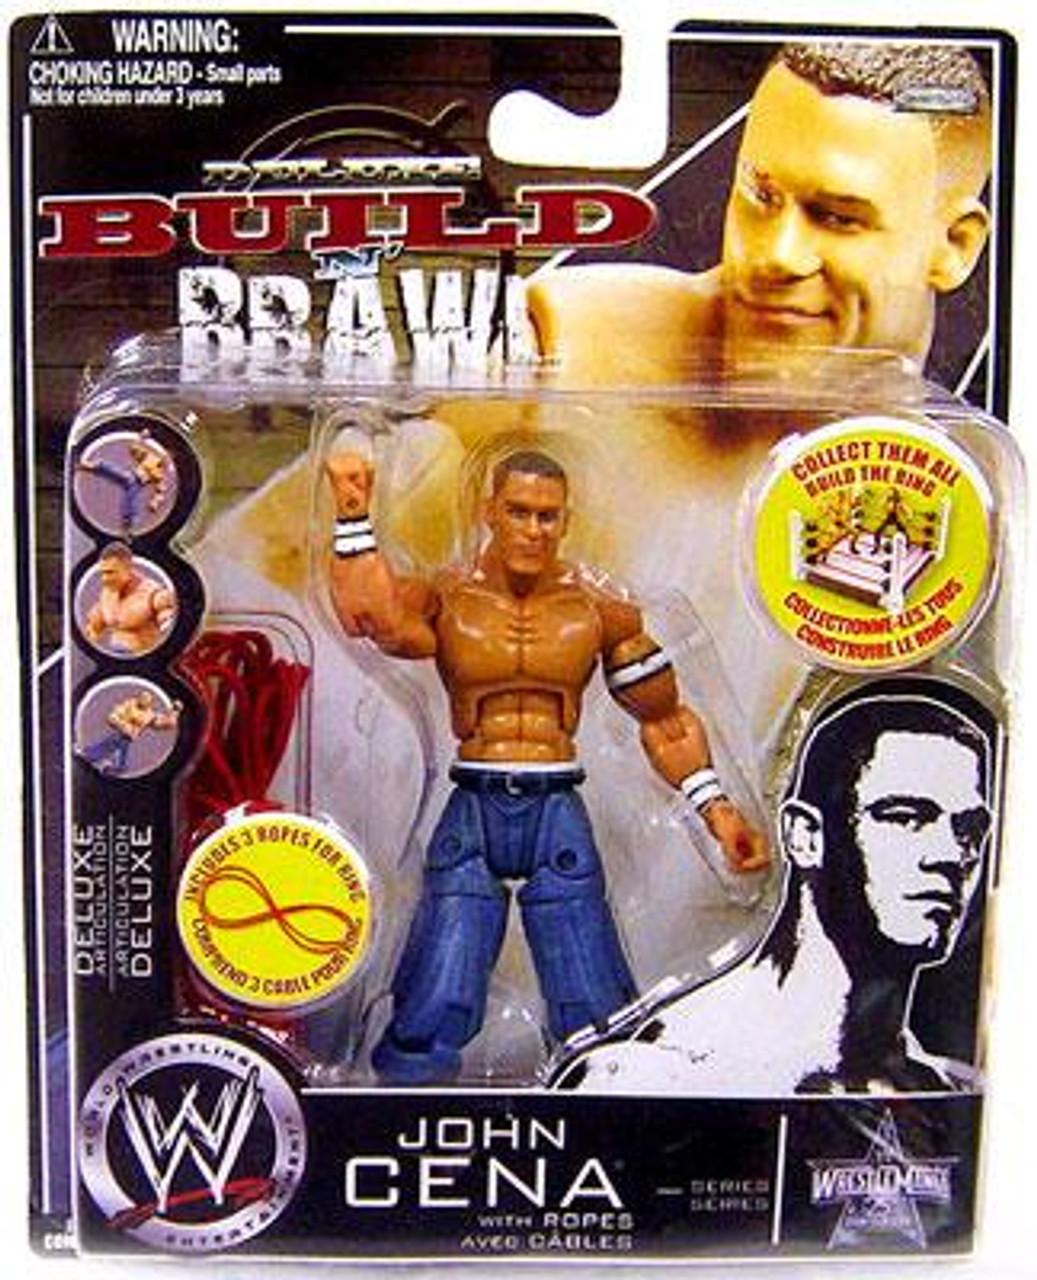 WWE Wrestling Build N' Brawl 25th Anniversary John Cena Action Figure